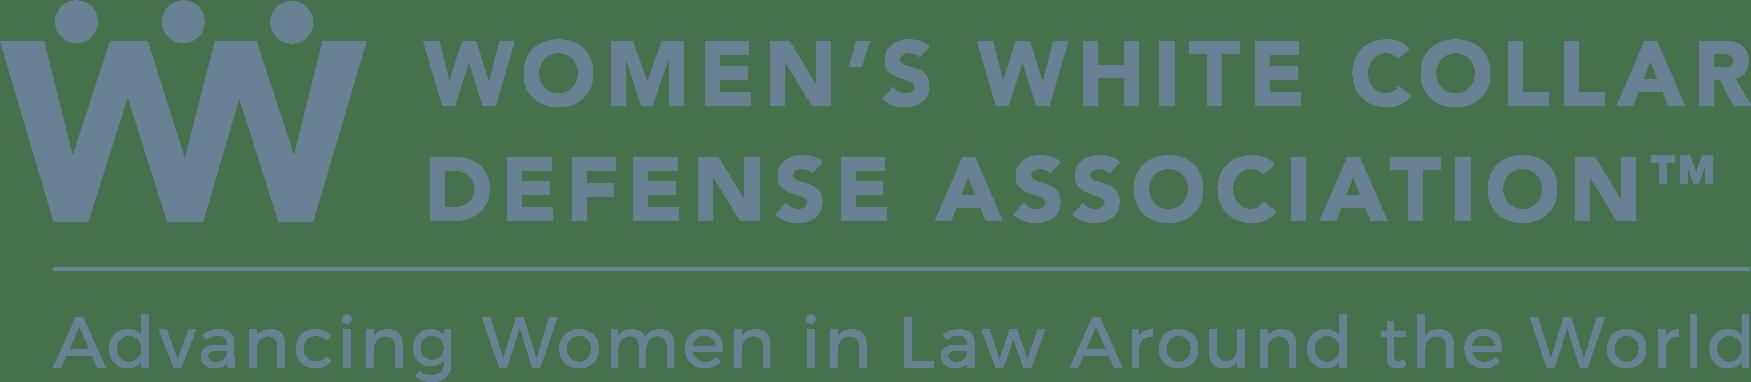 women s white collar defense association